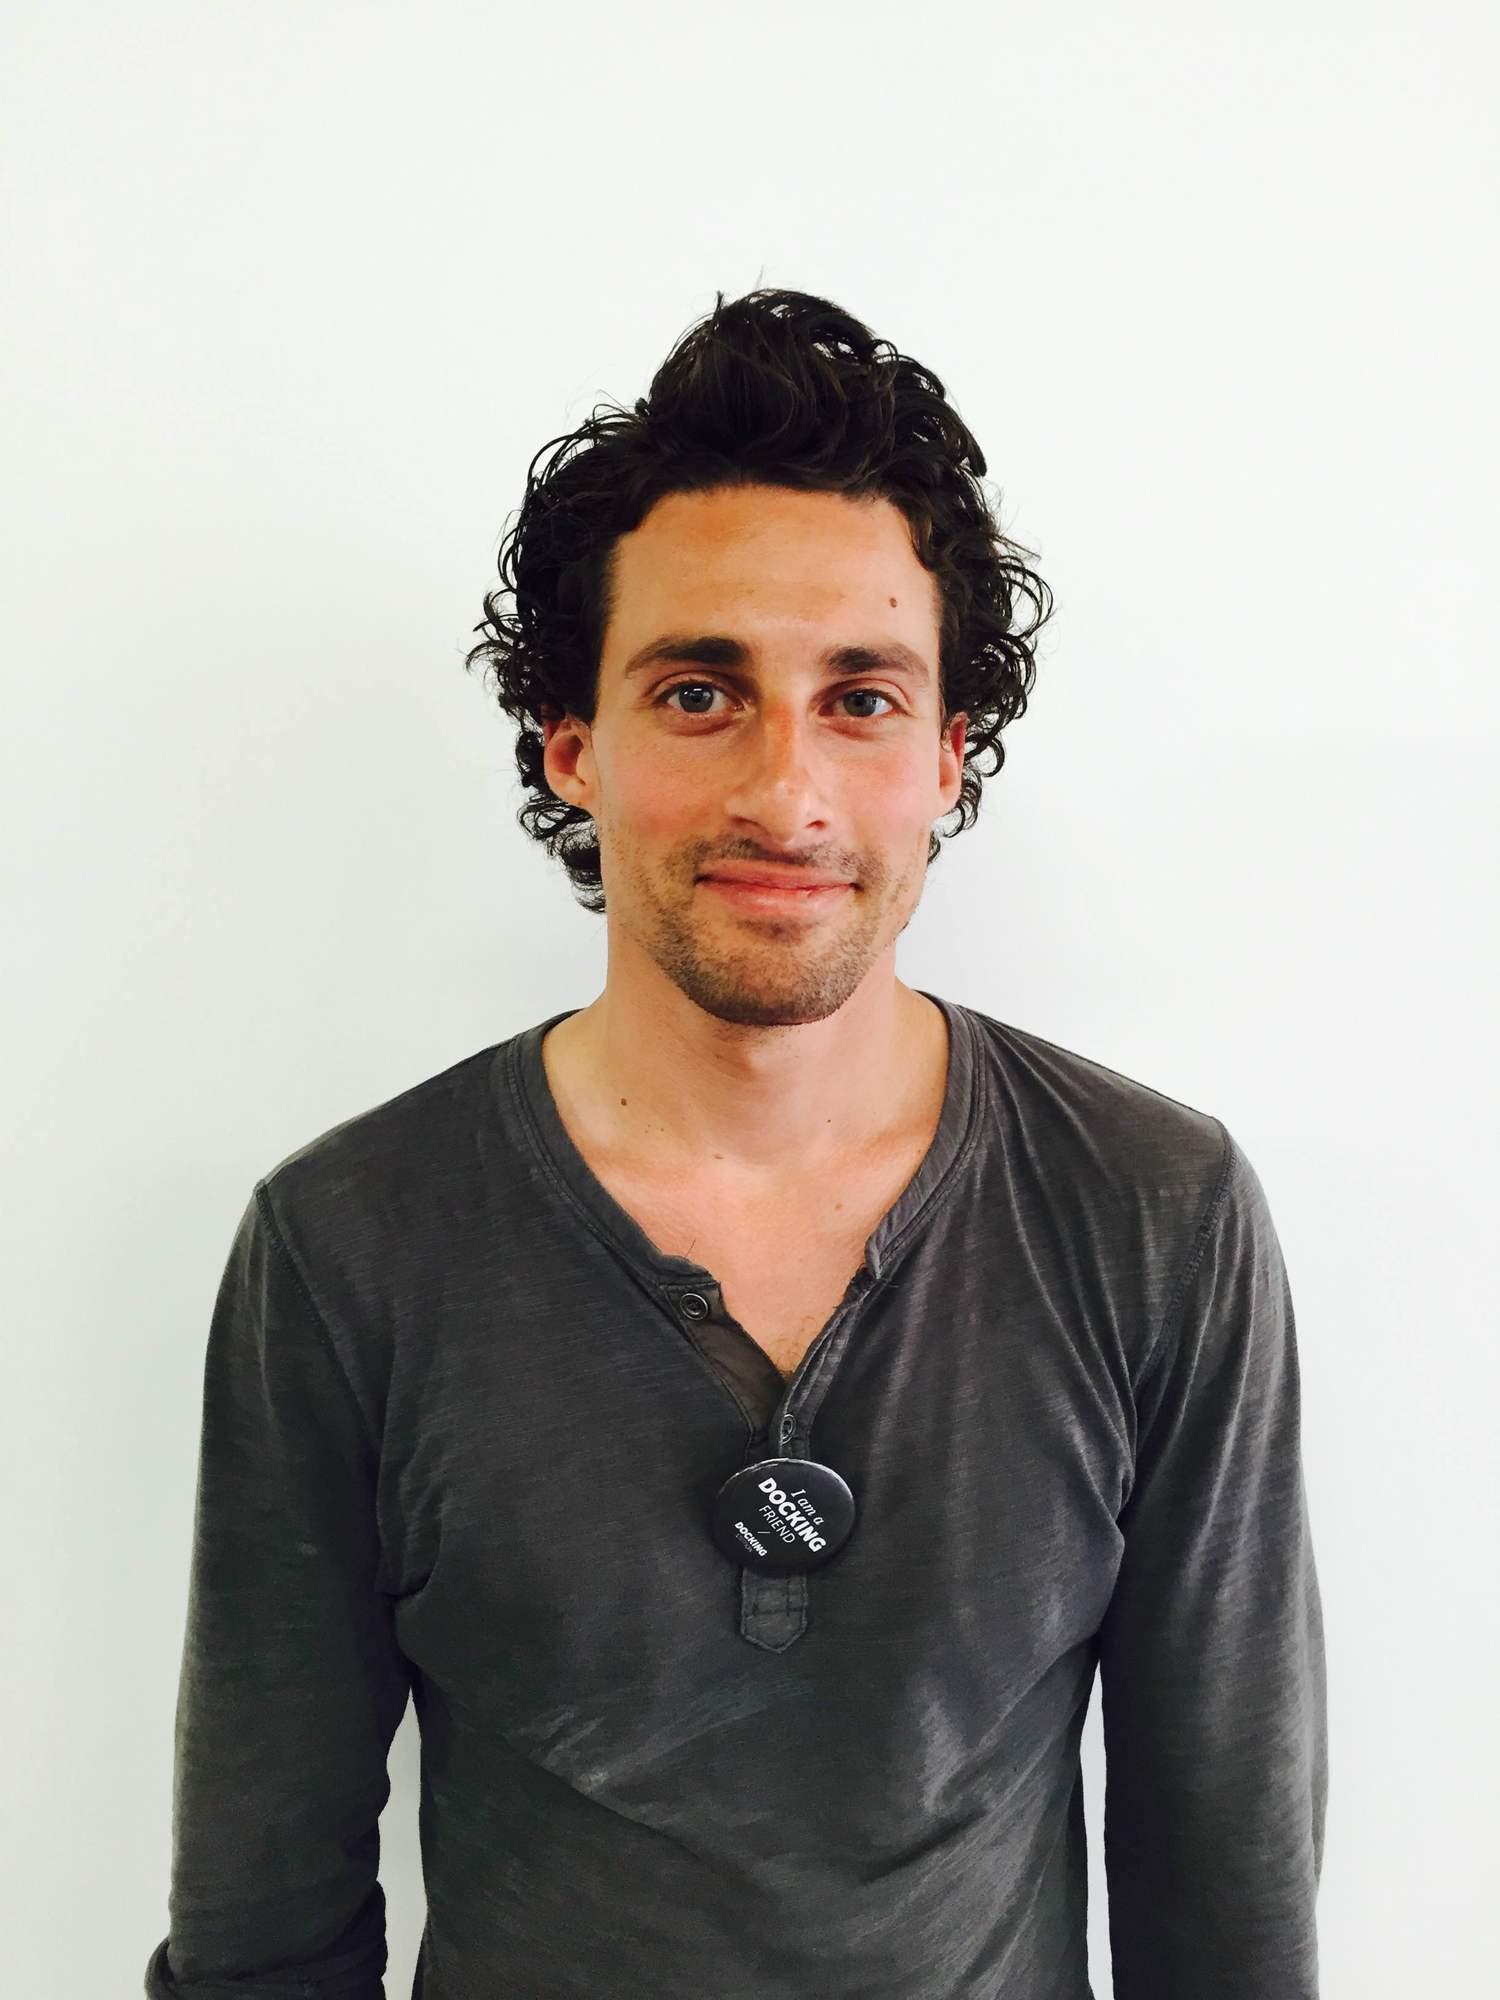 Marwan Bassiouni